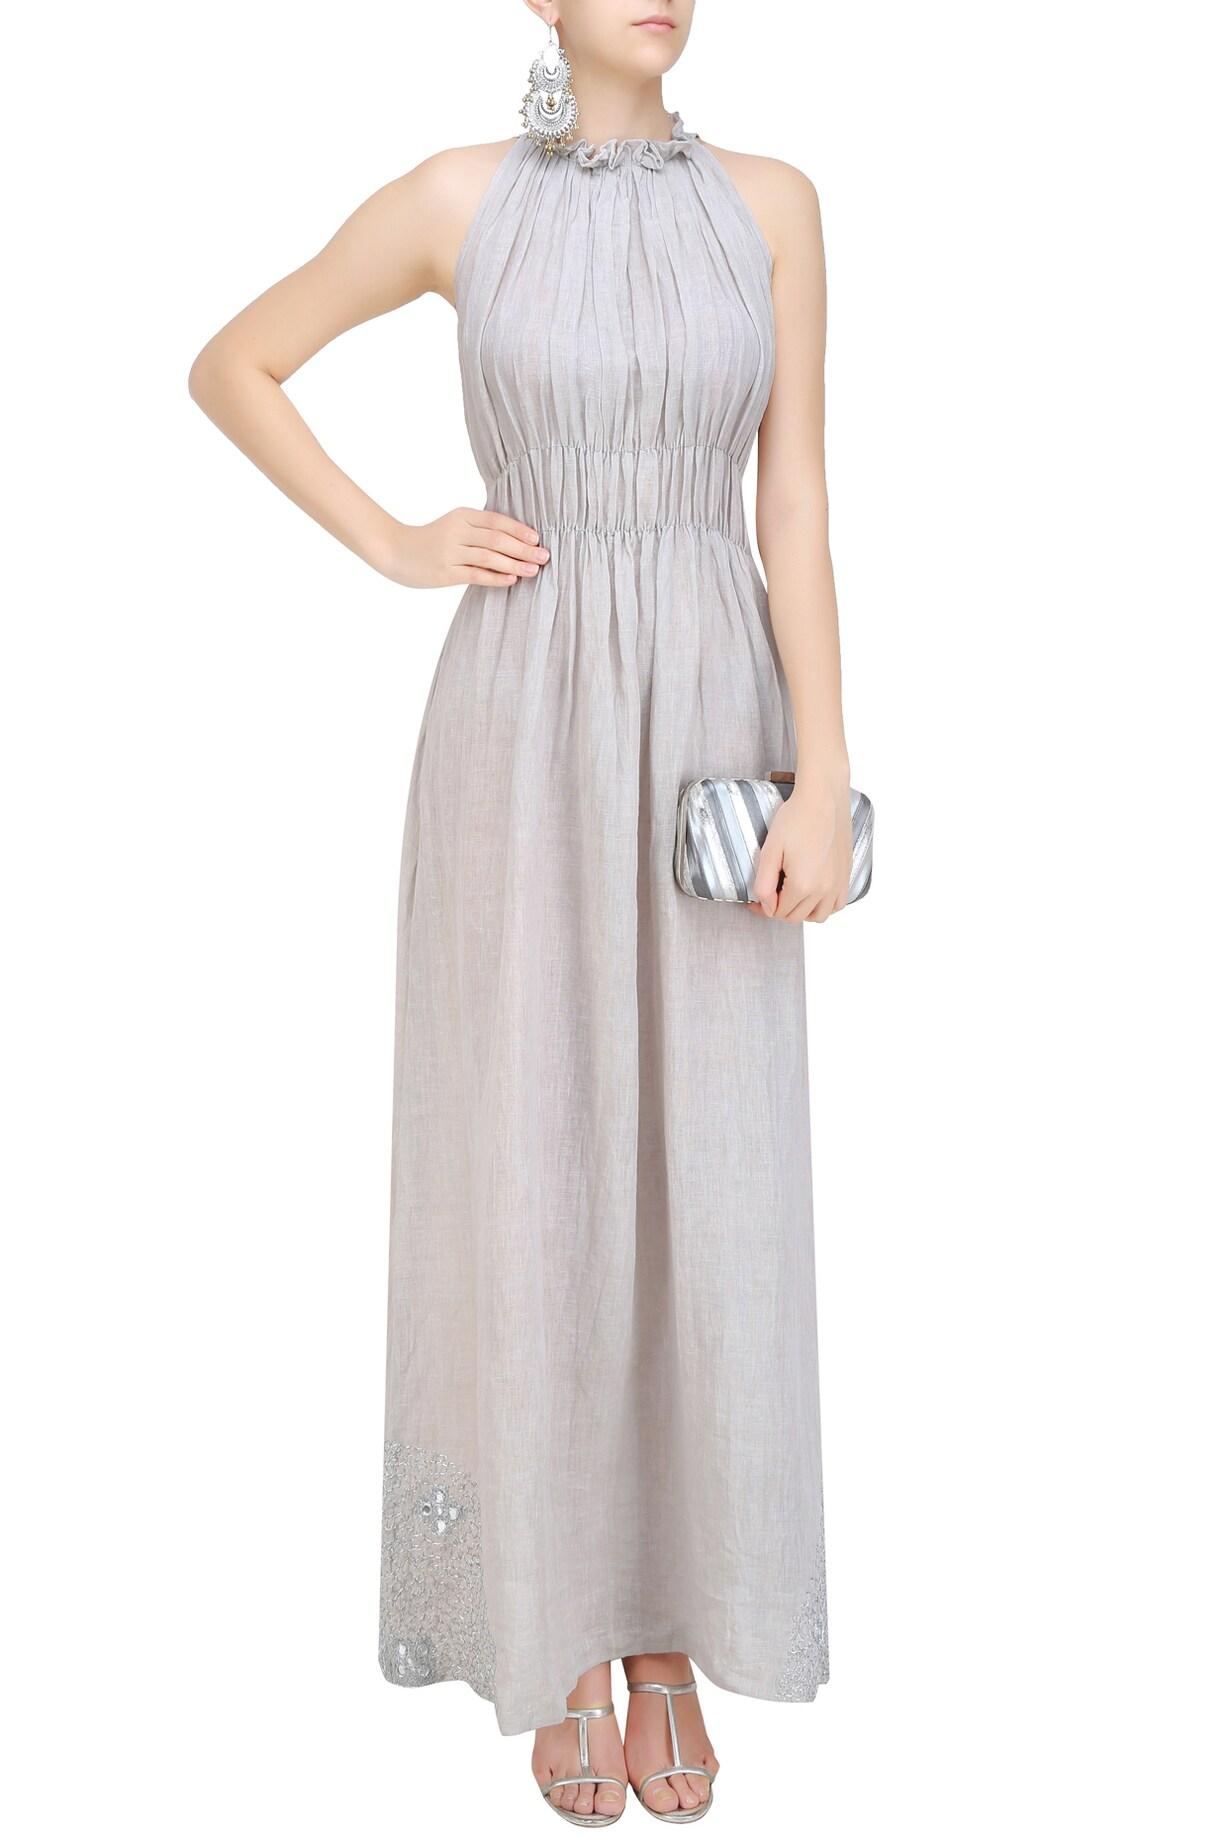 Ridhi Bansal Dresses